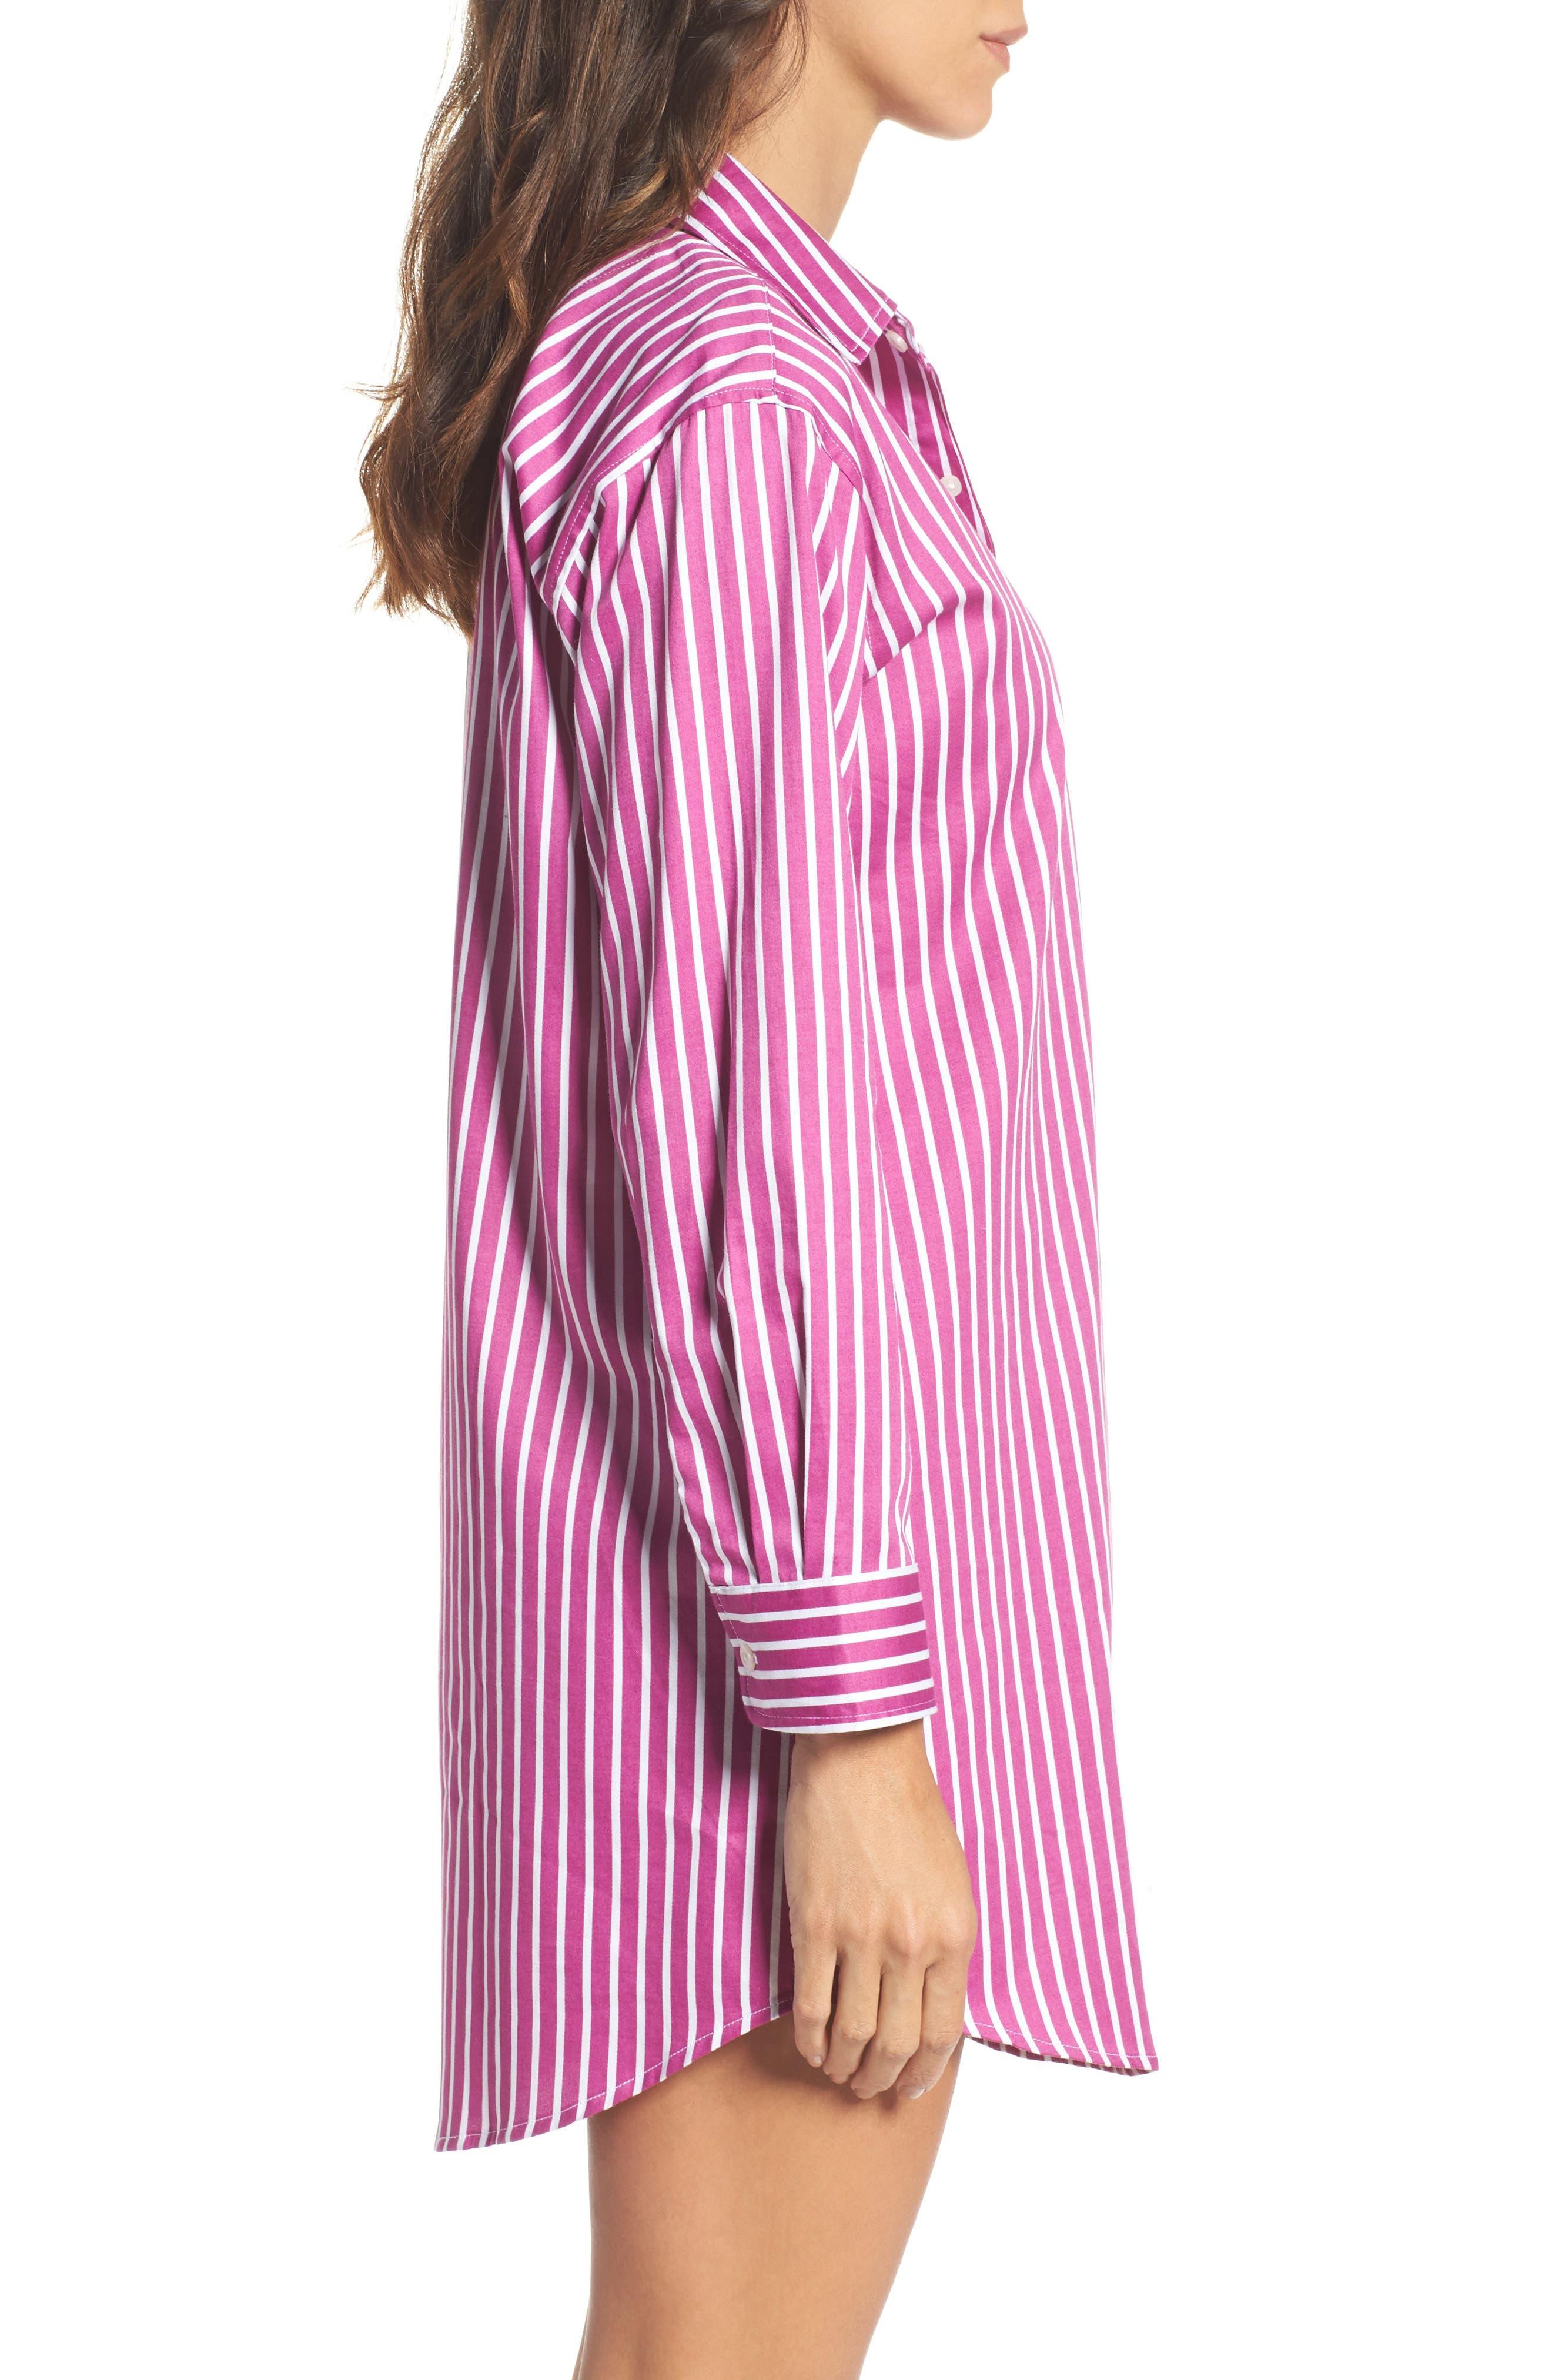 Sleep Shirt,                             Alternate thumbnail 3, color,                             Pink/ White Stripe